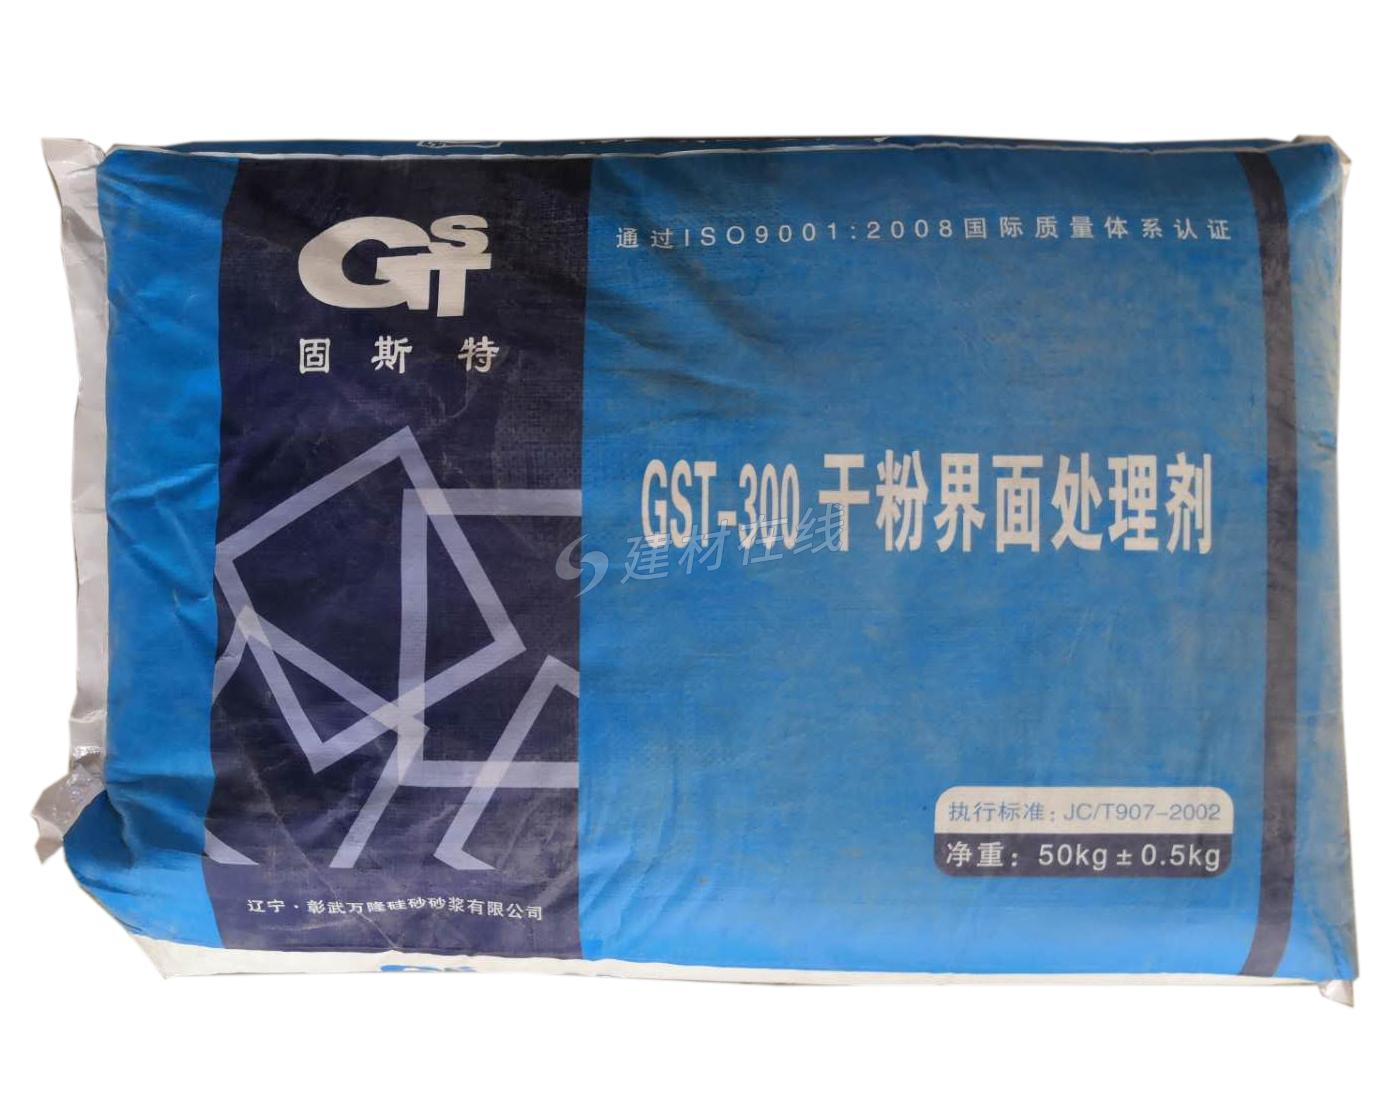 WL-300干粉界面劑.126x156.jpg